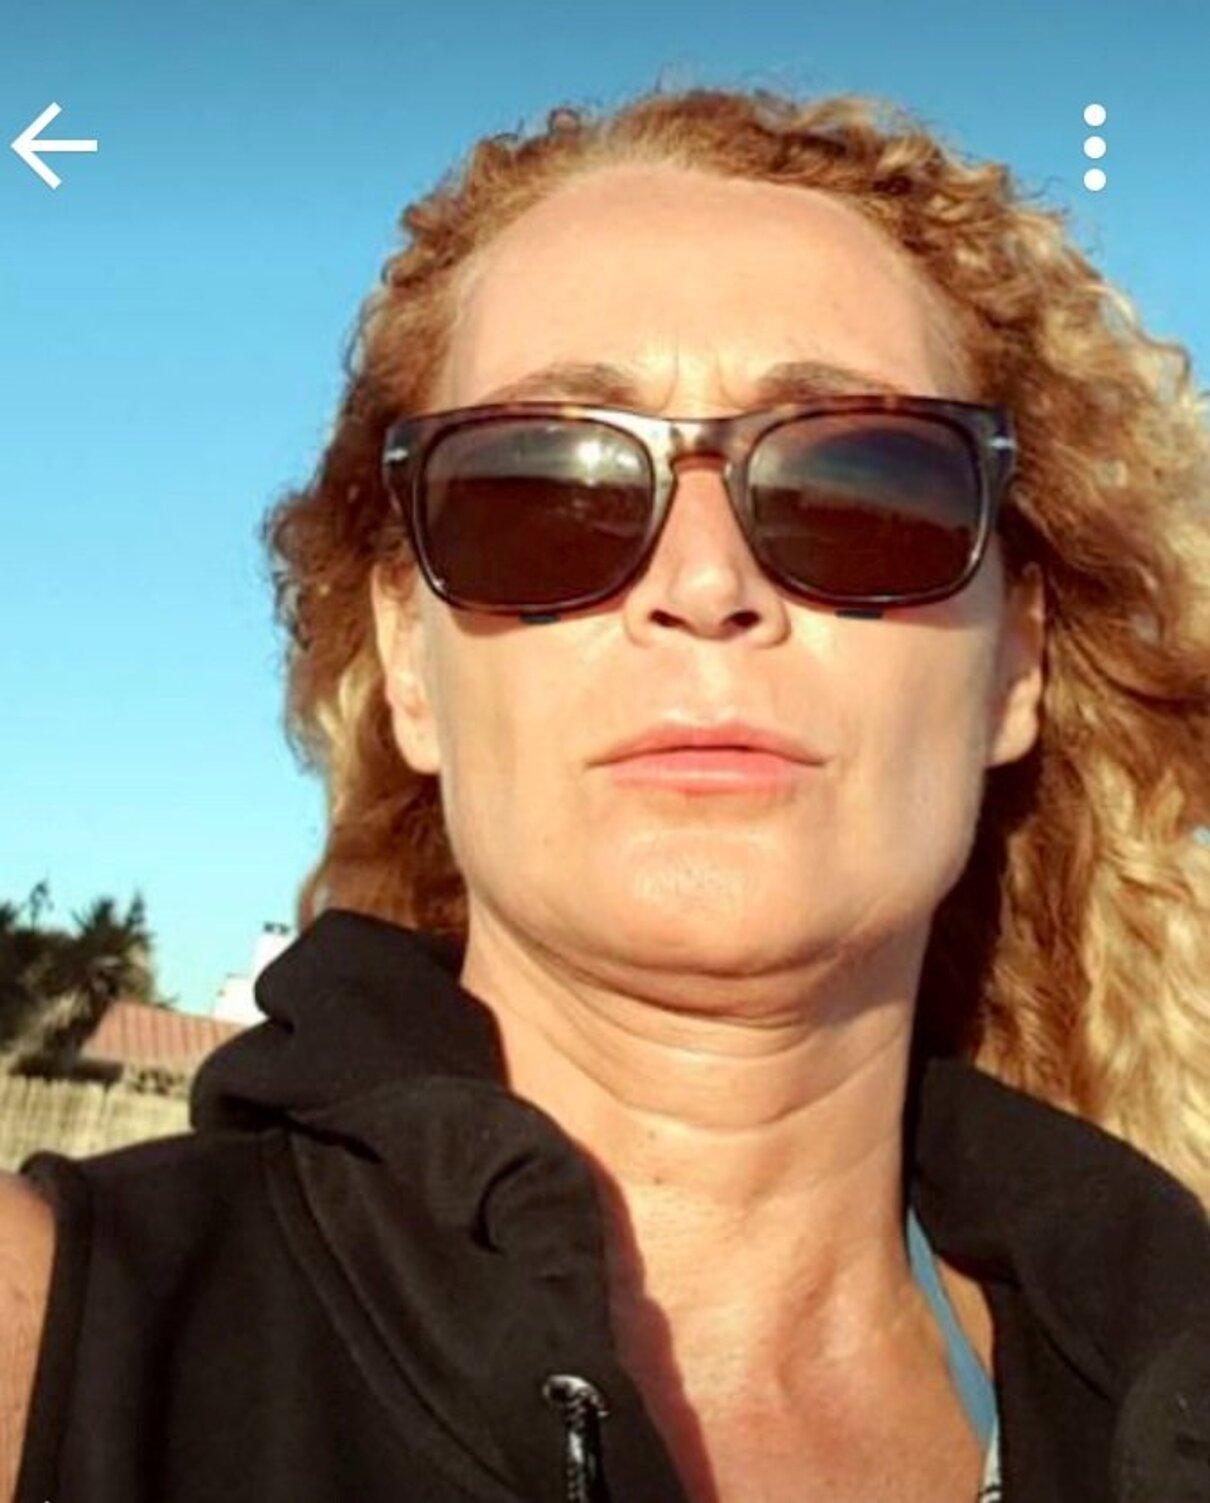 Жалоба-отзыв: Annarita Passalacqua - trangender e gay tour a Roma# Civitavecchia#CIVITATOURS#LIANDRO VIAGGI# Мы - украинцы проживающие в Германии - Annarita Passalacqua - trangender e gay tour a Roma# Civitavecchia#CIVITATOURS#LIANDRO VIAGGI# Мы - украинцы проживающие в Германии.  Фото №1